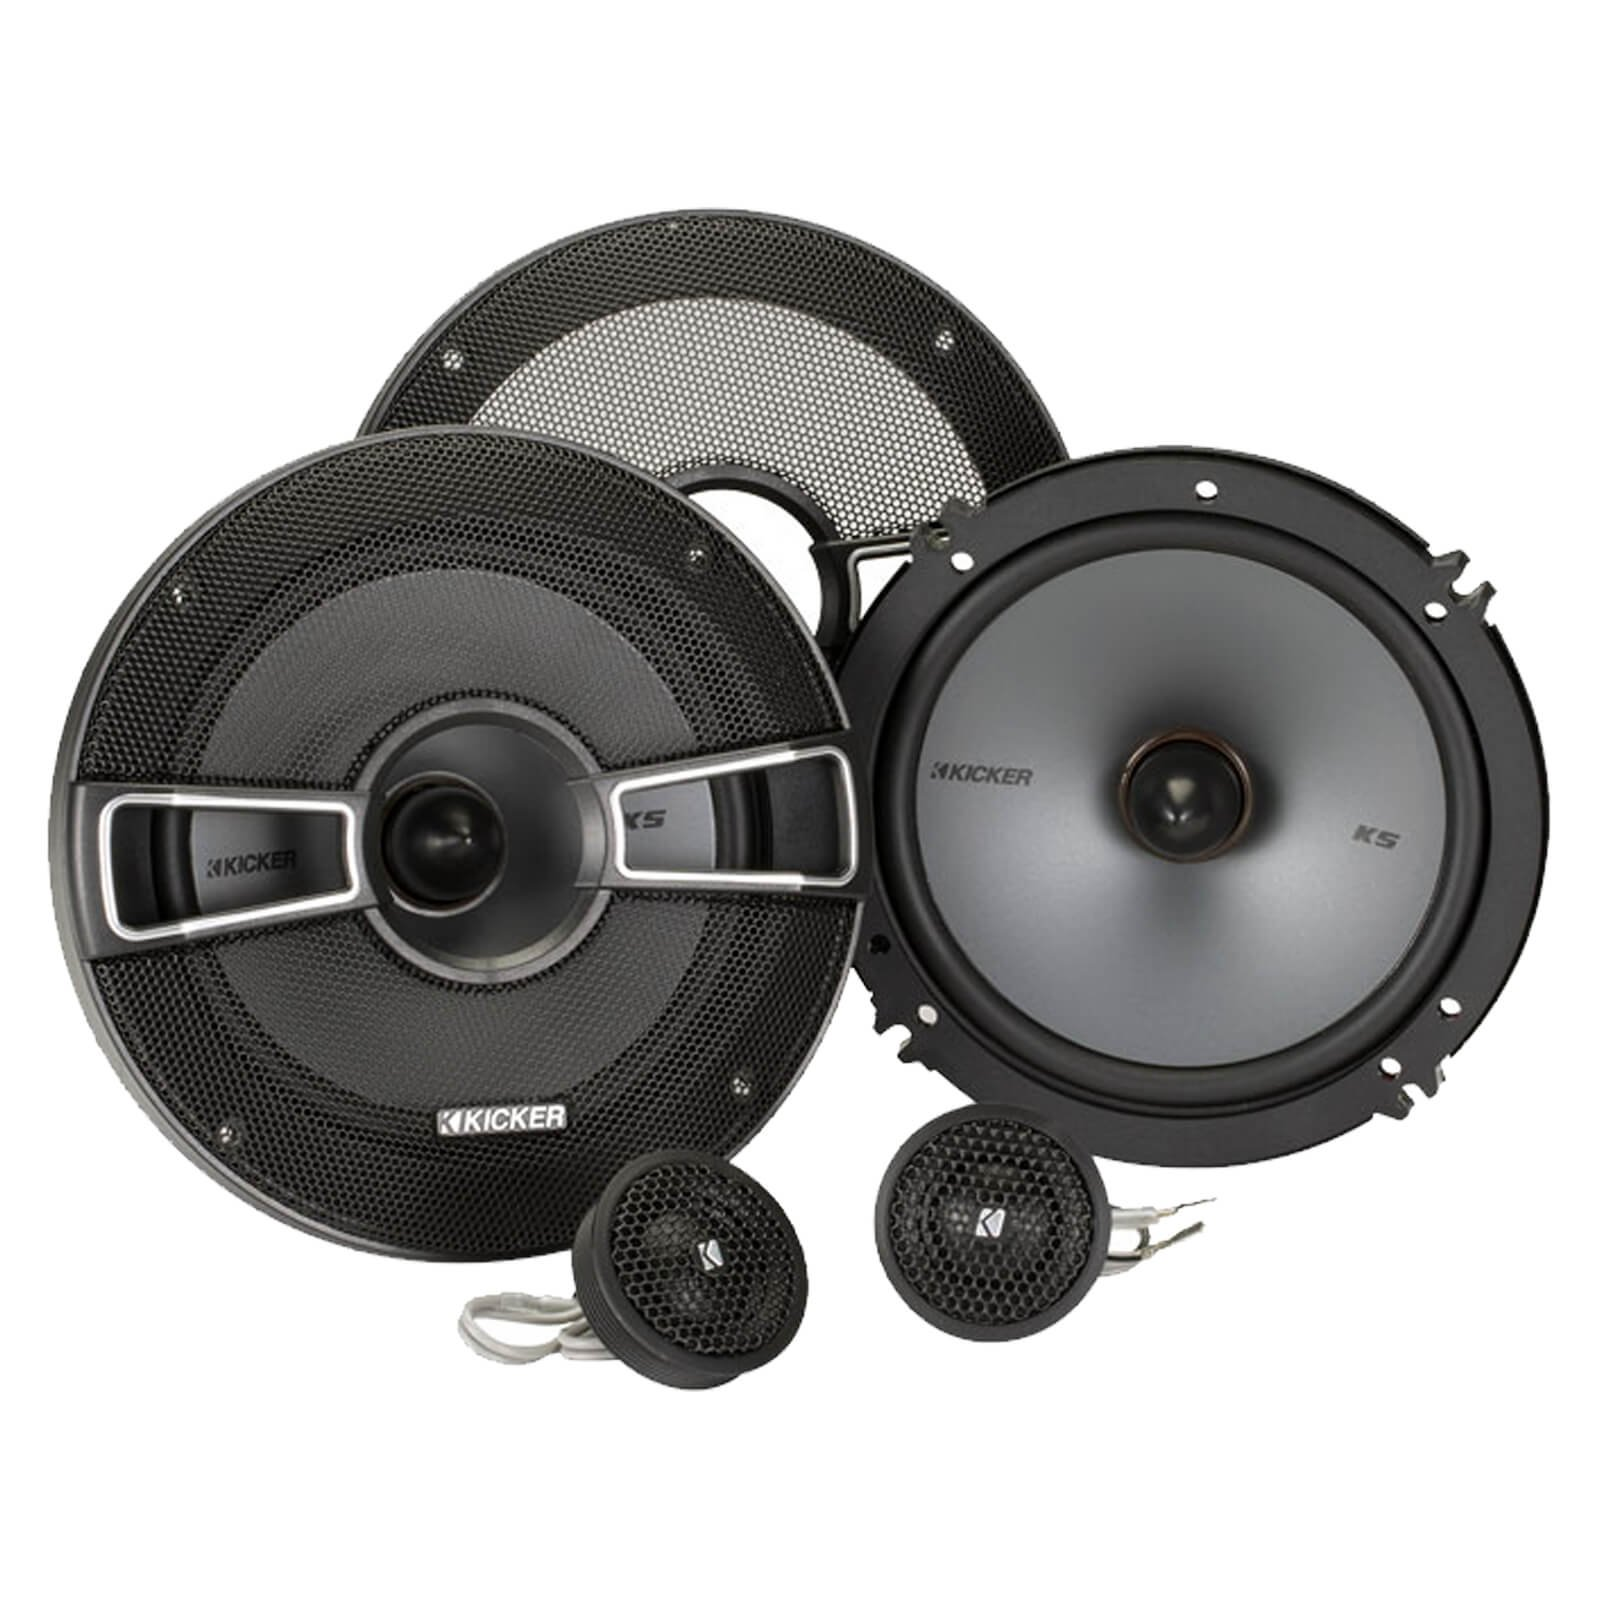 Kicker 41KSS654 6.5 inch Component Speakers